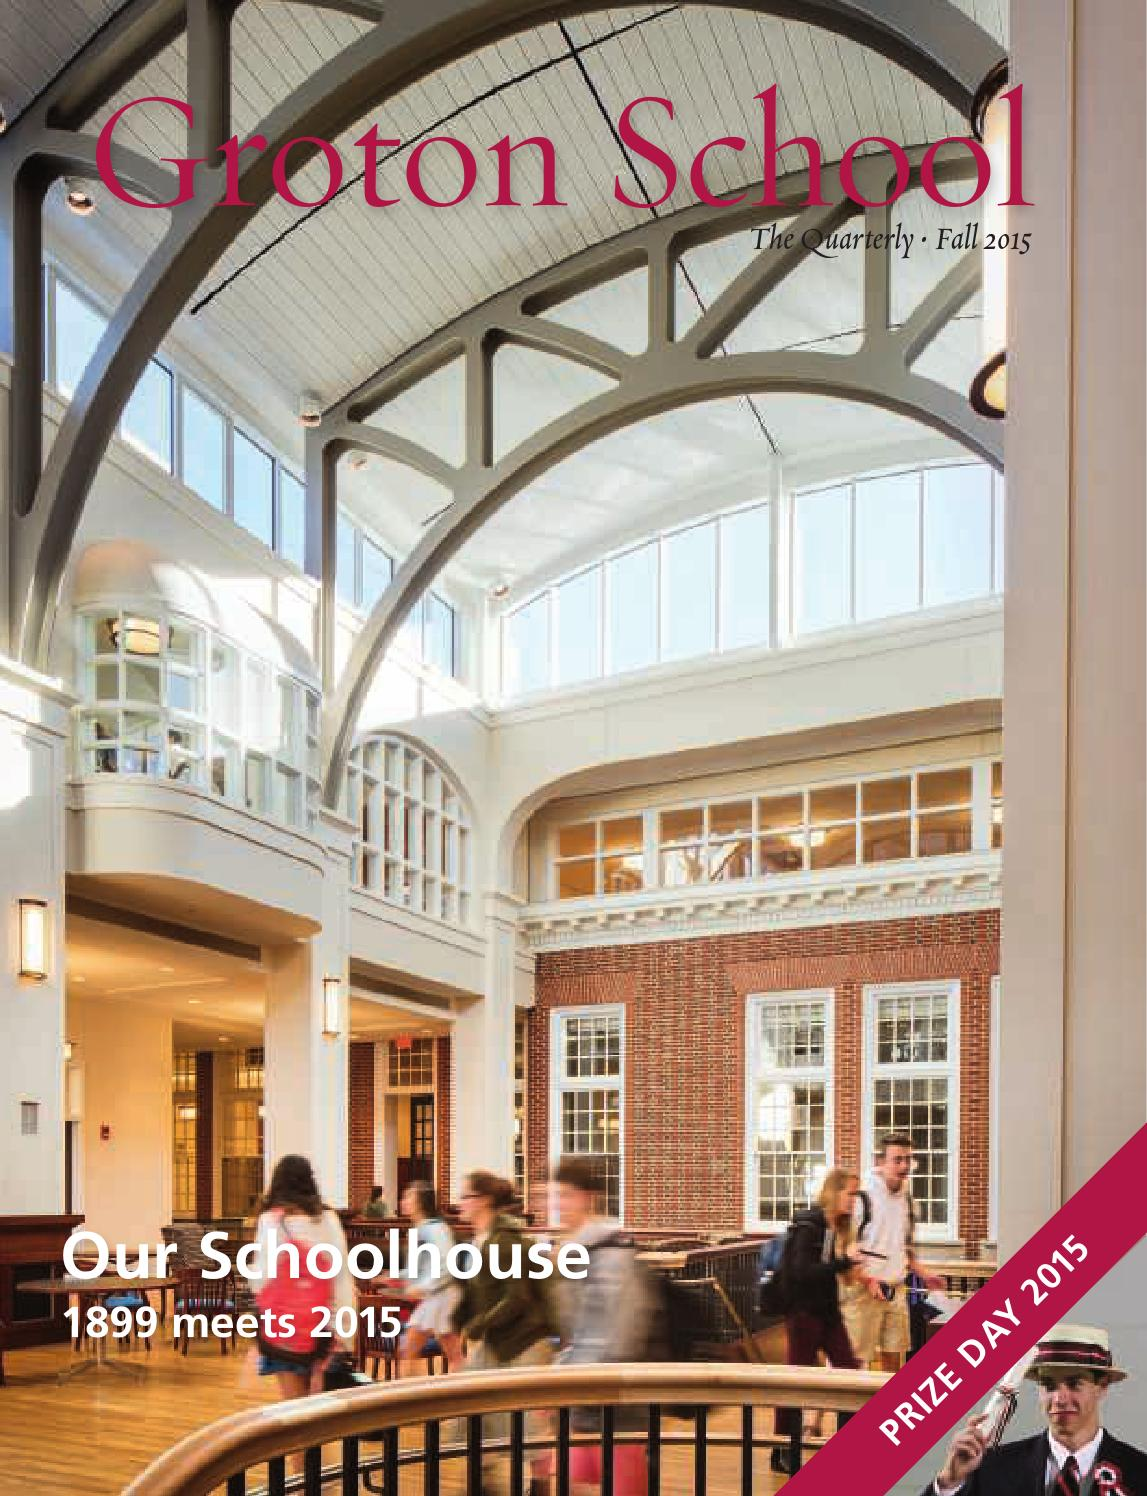 ea1d54622a0 Groton School Quarterly